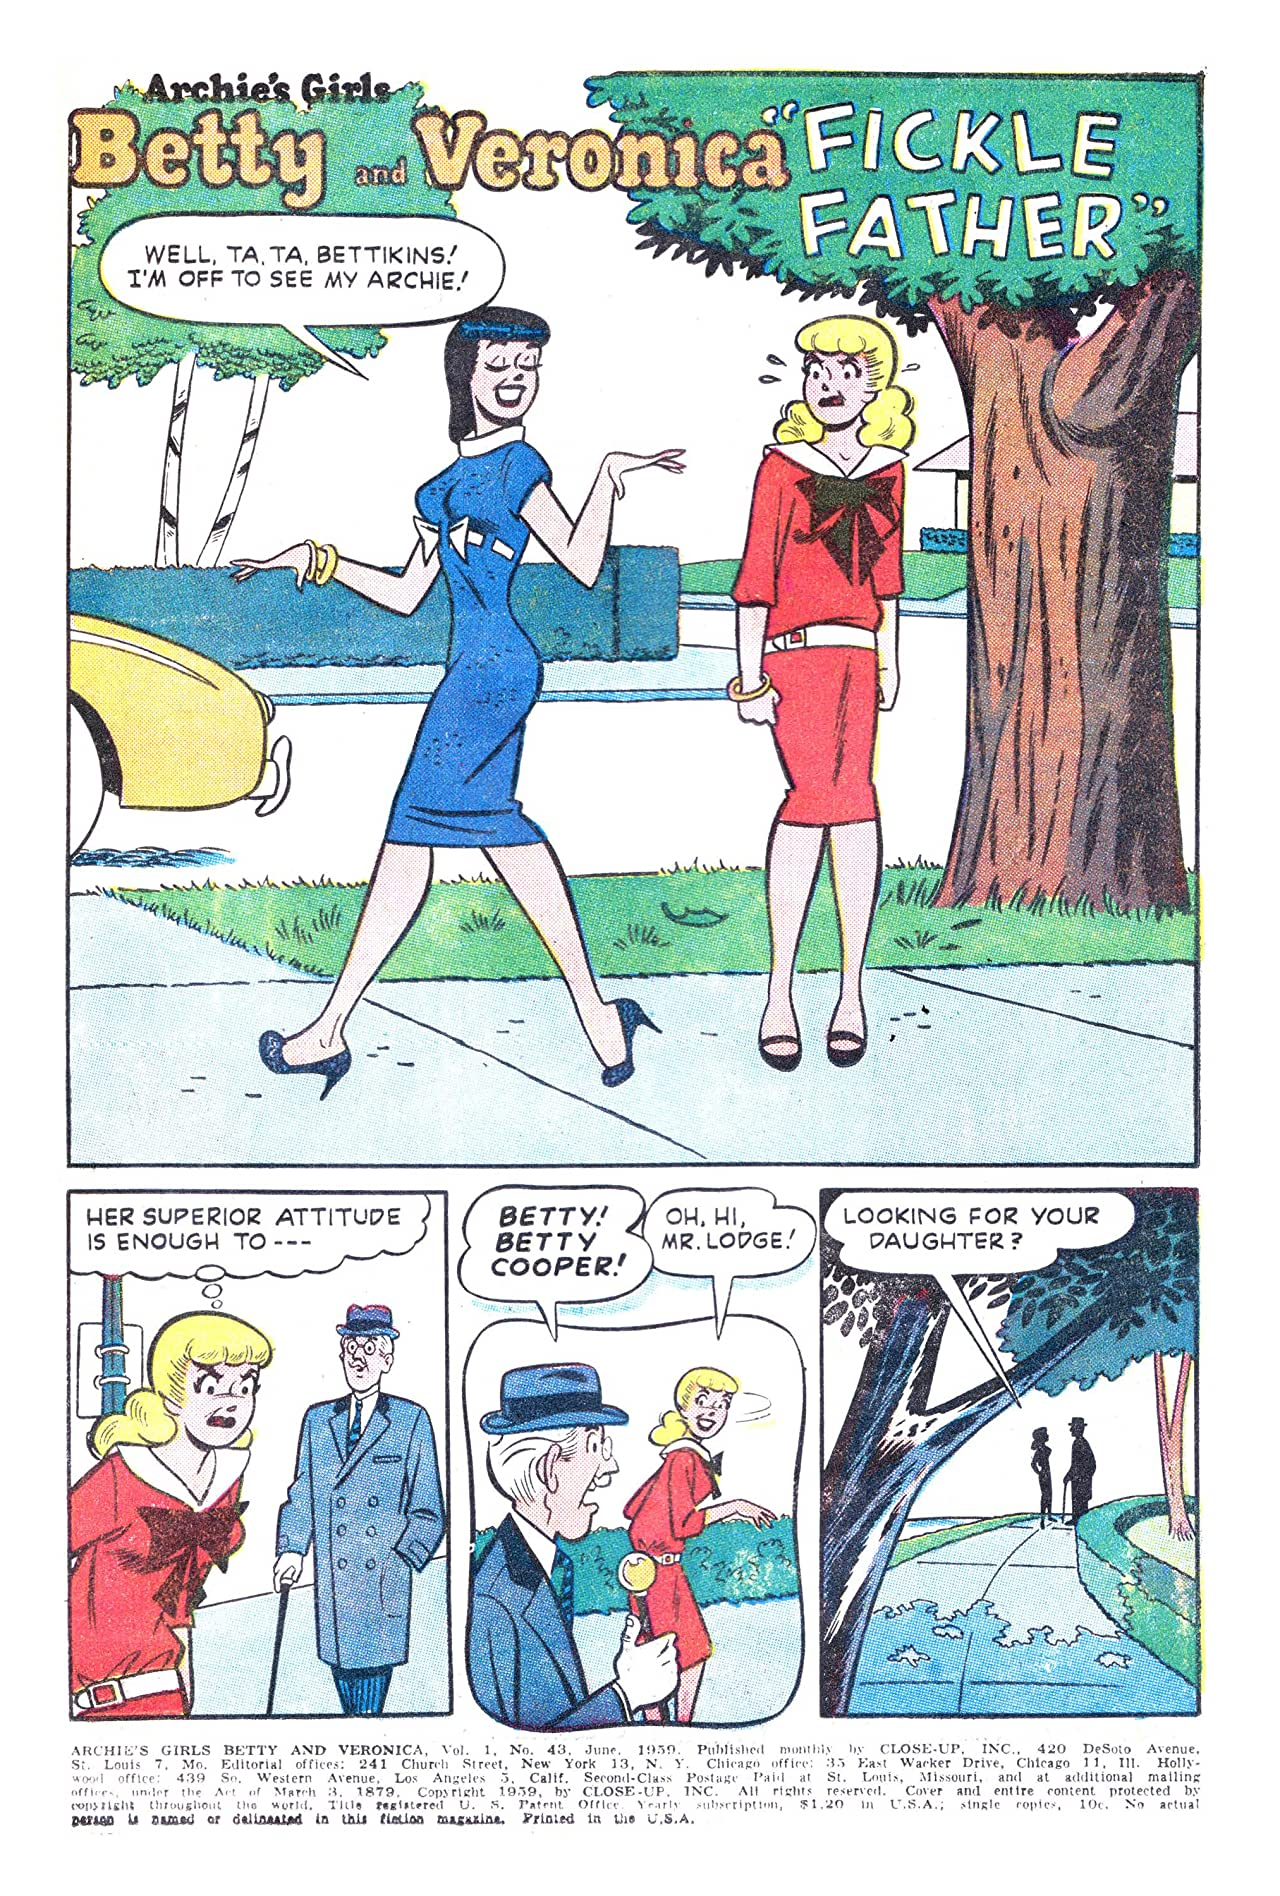 Archie's Girls Betty & Veronica #43